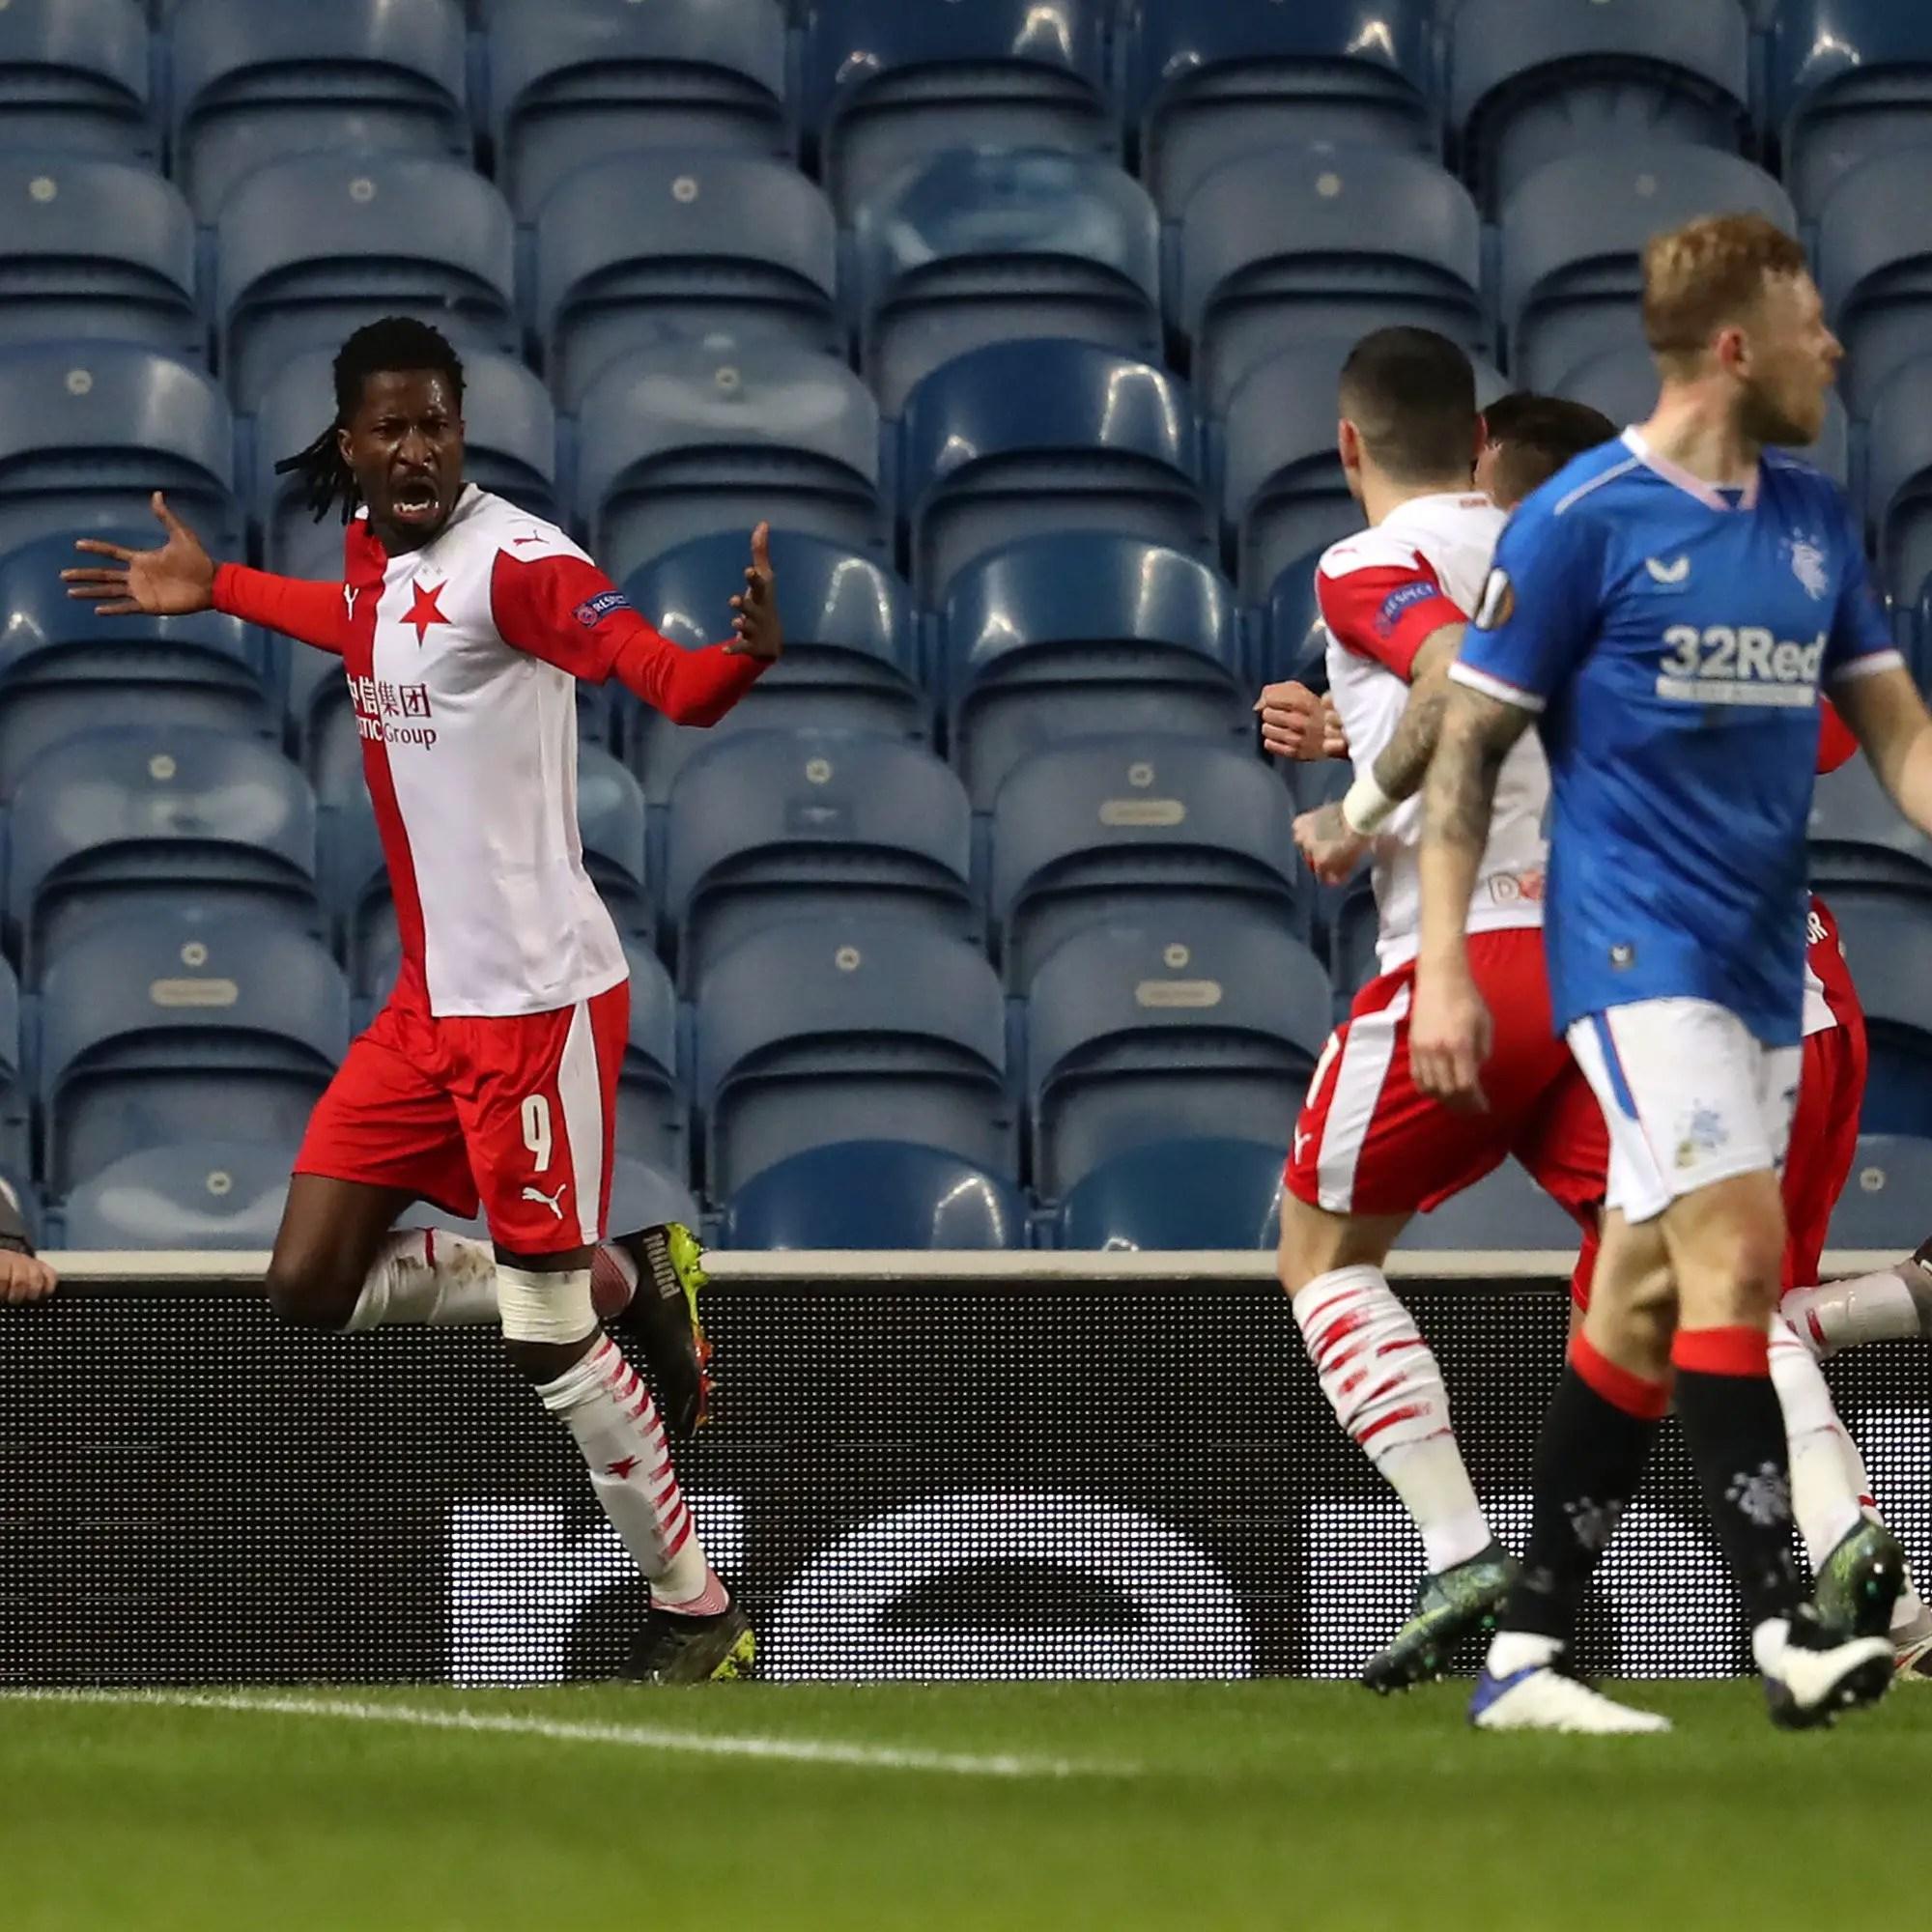 Europa: Olayinka On Target, Balogun Sent Off As Slavia Prague Eliminate Rangers, Chukwueze Bags Assist In Villarreal's Home Win Vs Dynamo Kyiv